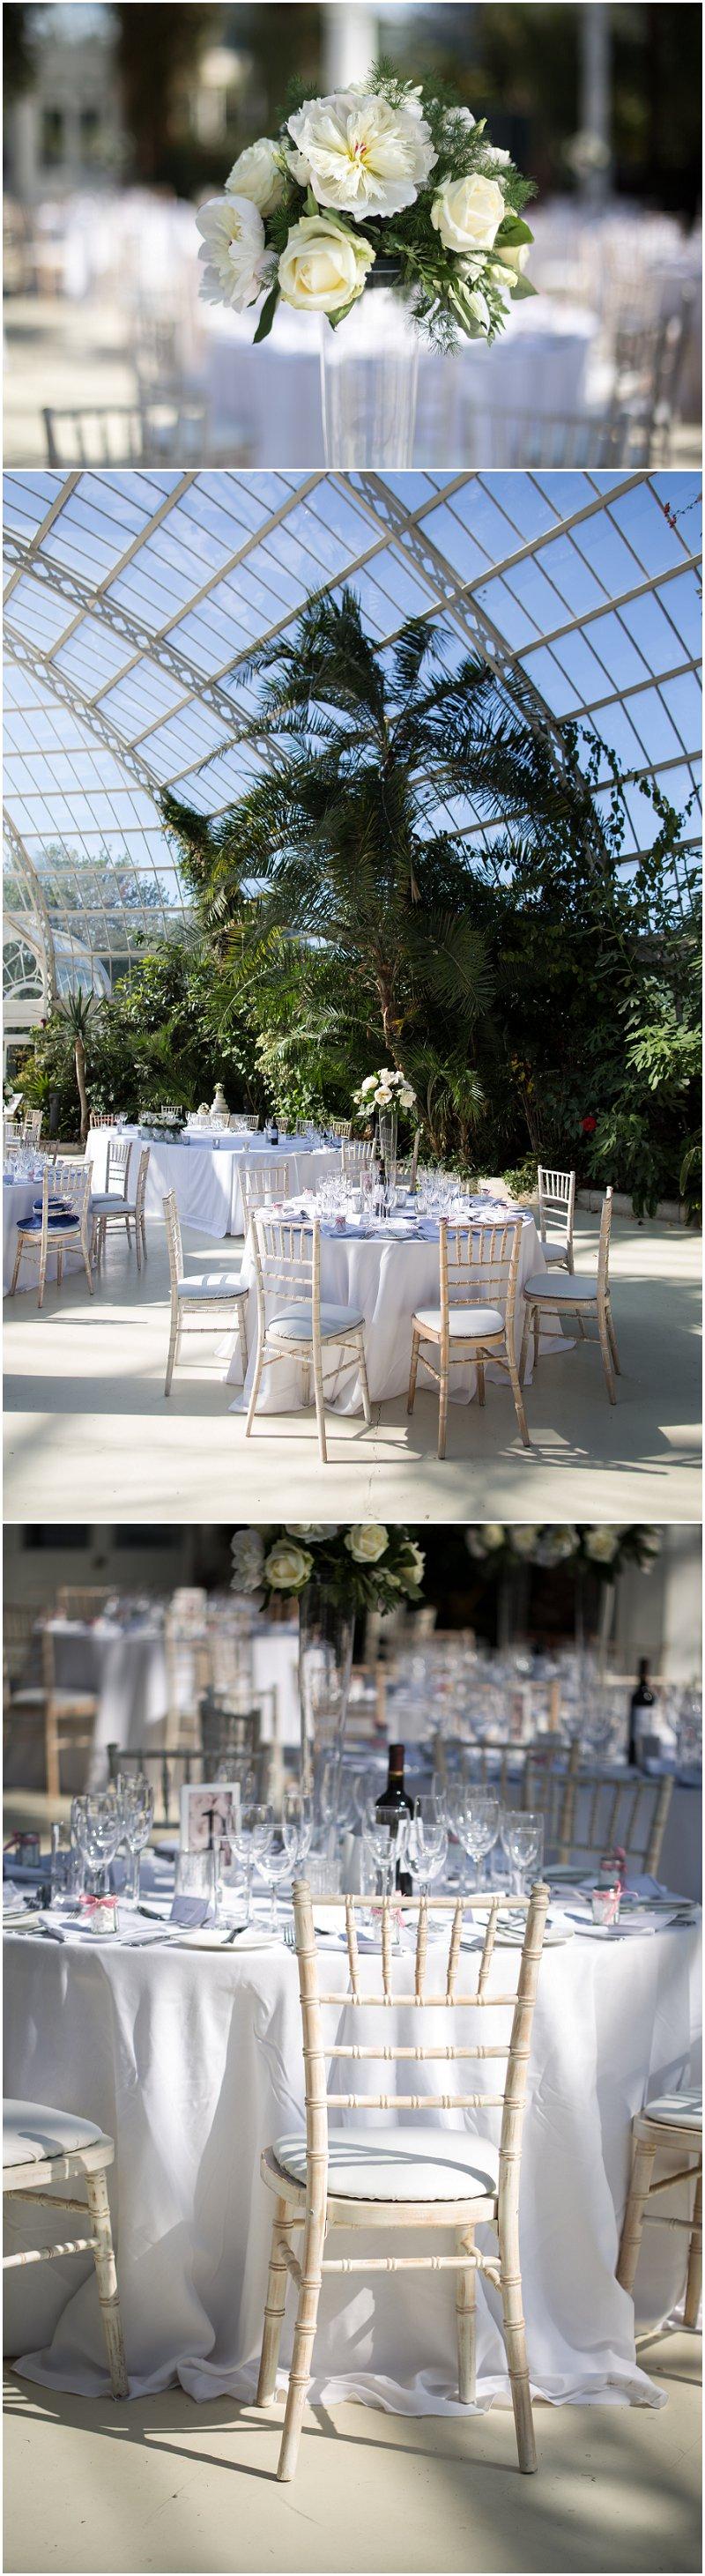 Sefton Park Wedding Photographer Palm House